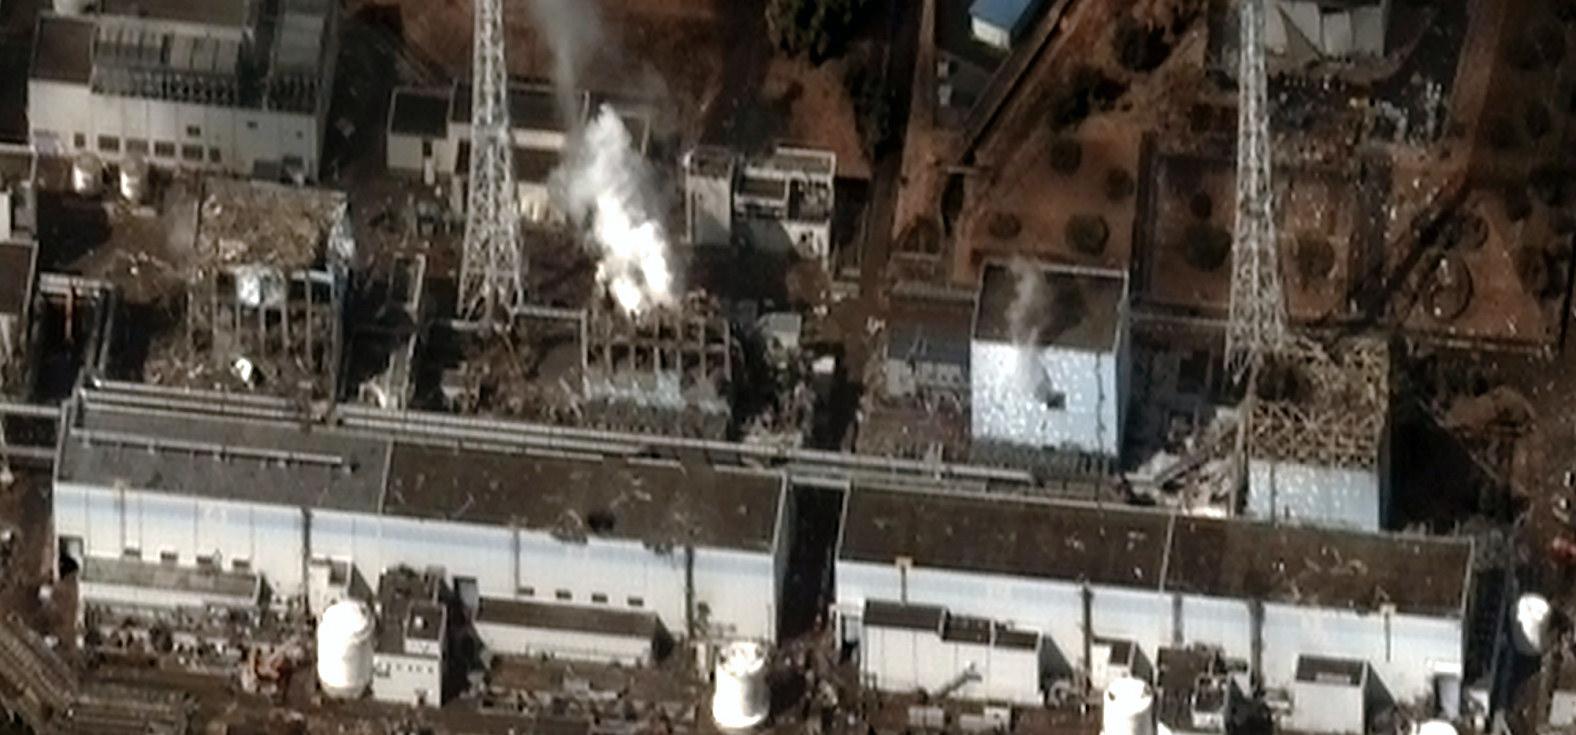 Fukushima Daichii nuclear power plant / Image: Wikimedia Commons